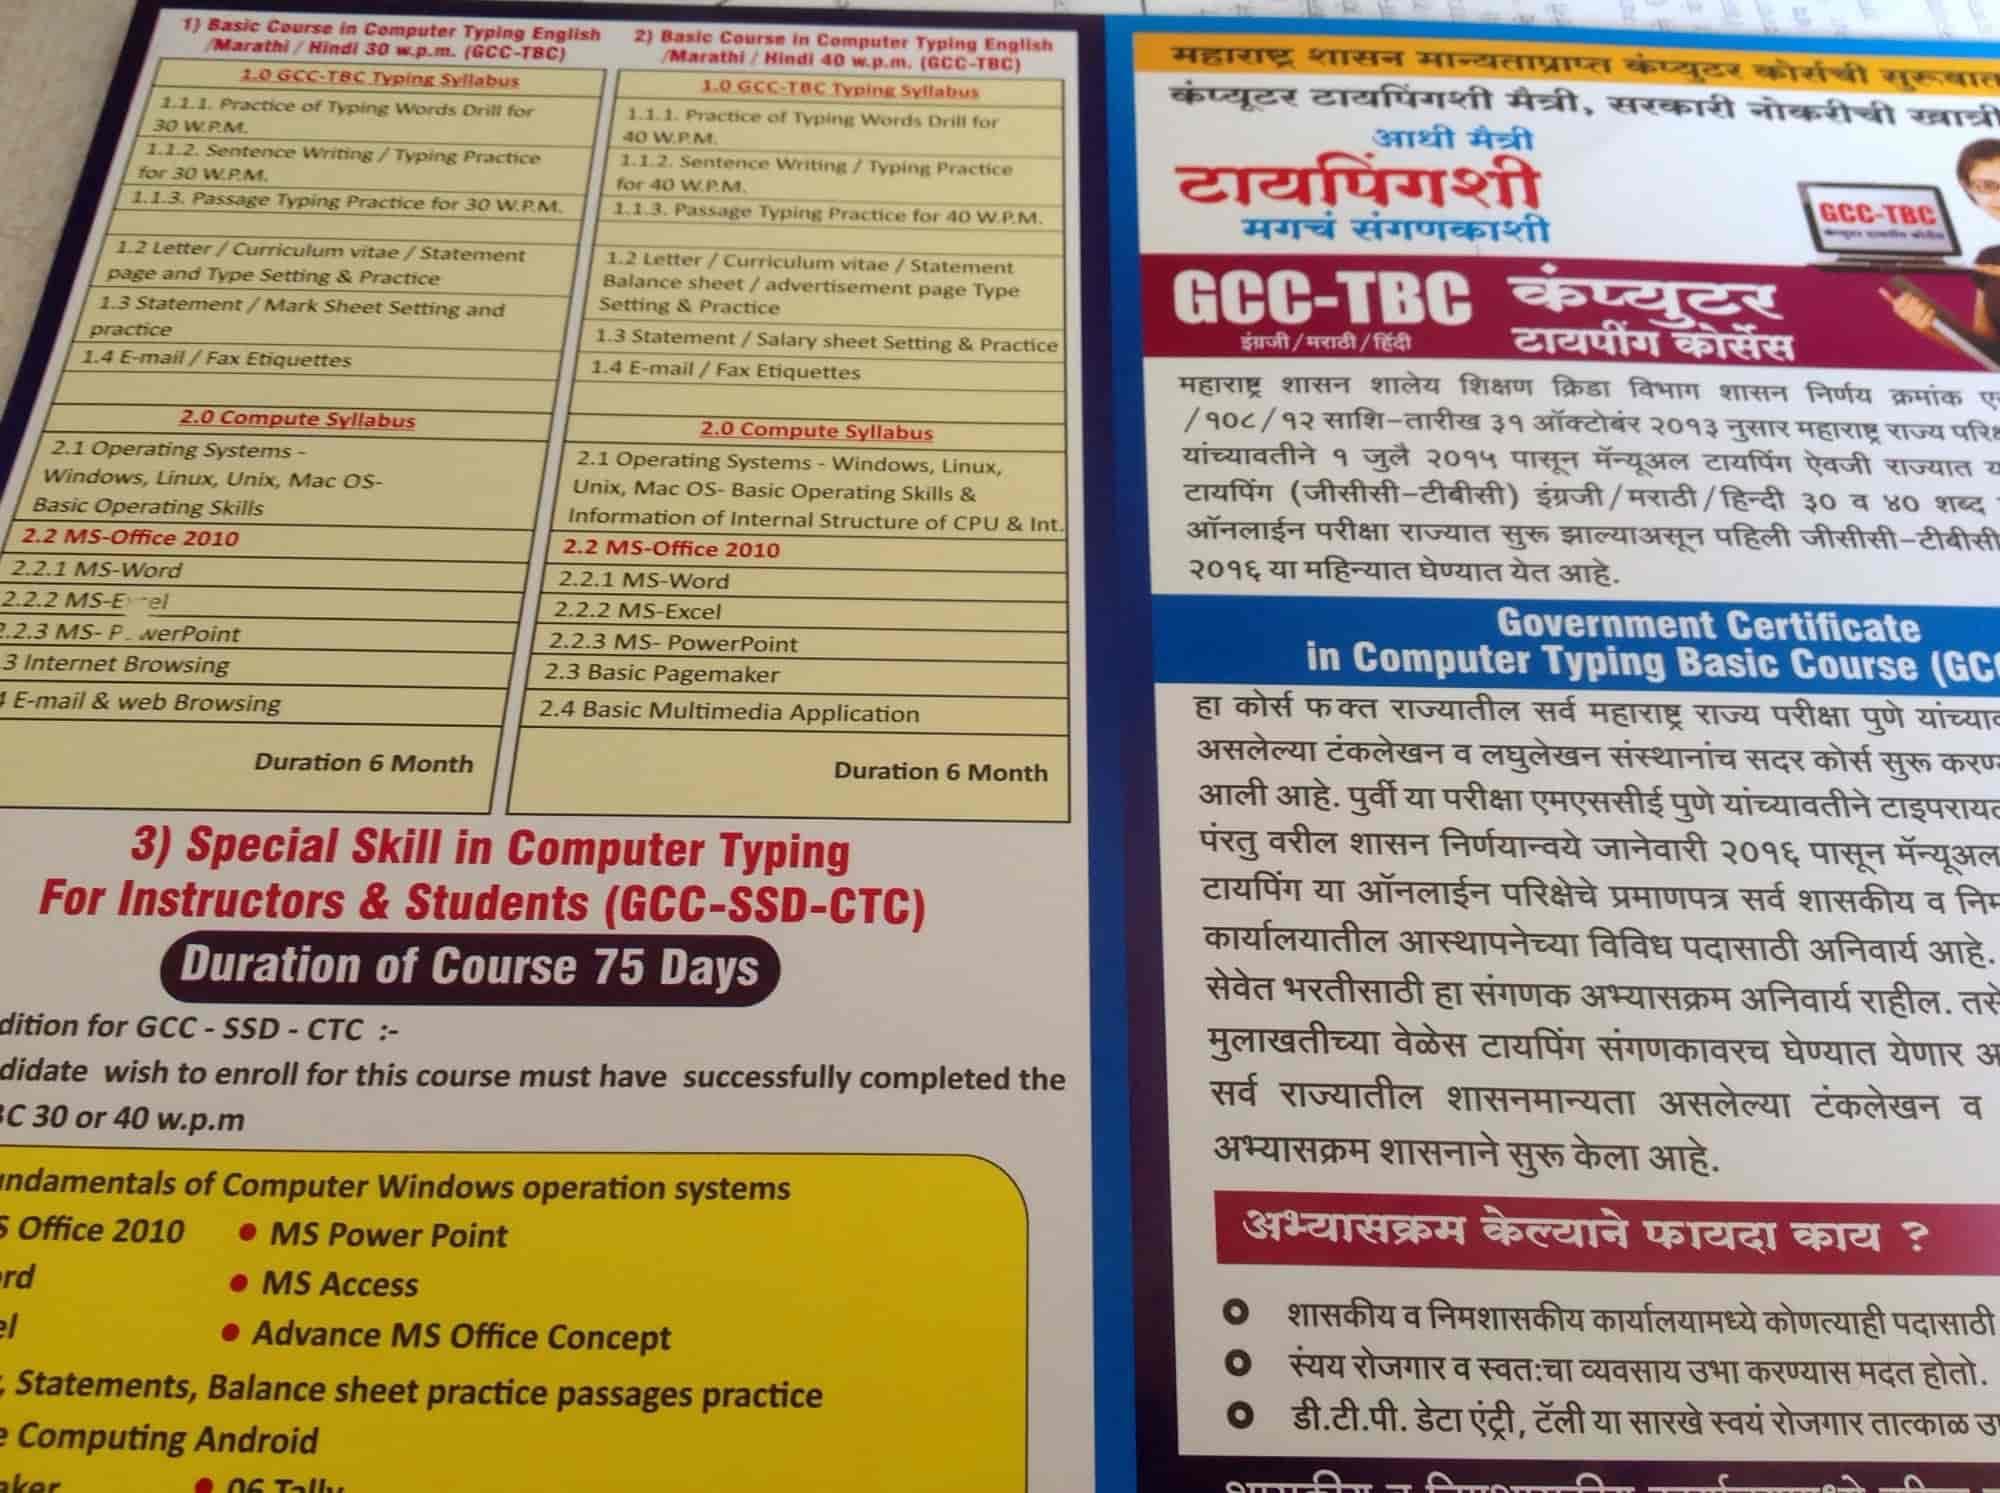 Jai Durga Computer Typing Insititute, Jalna HO - DTP